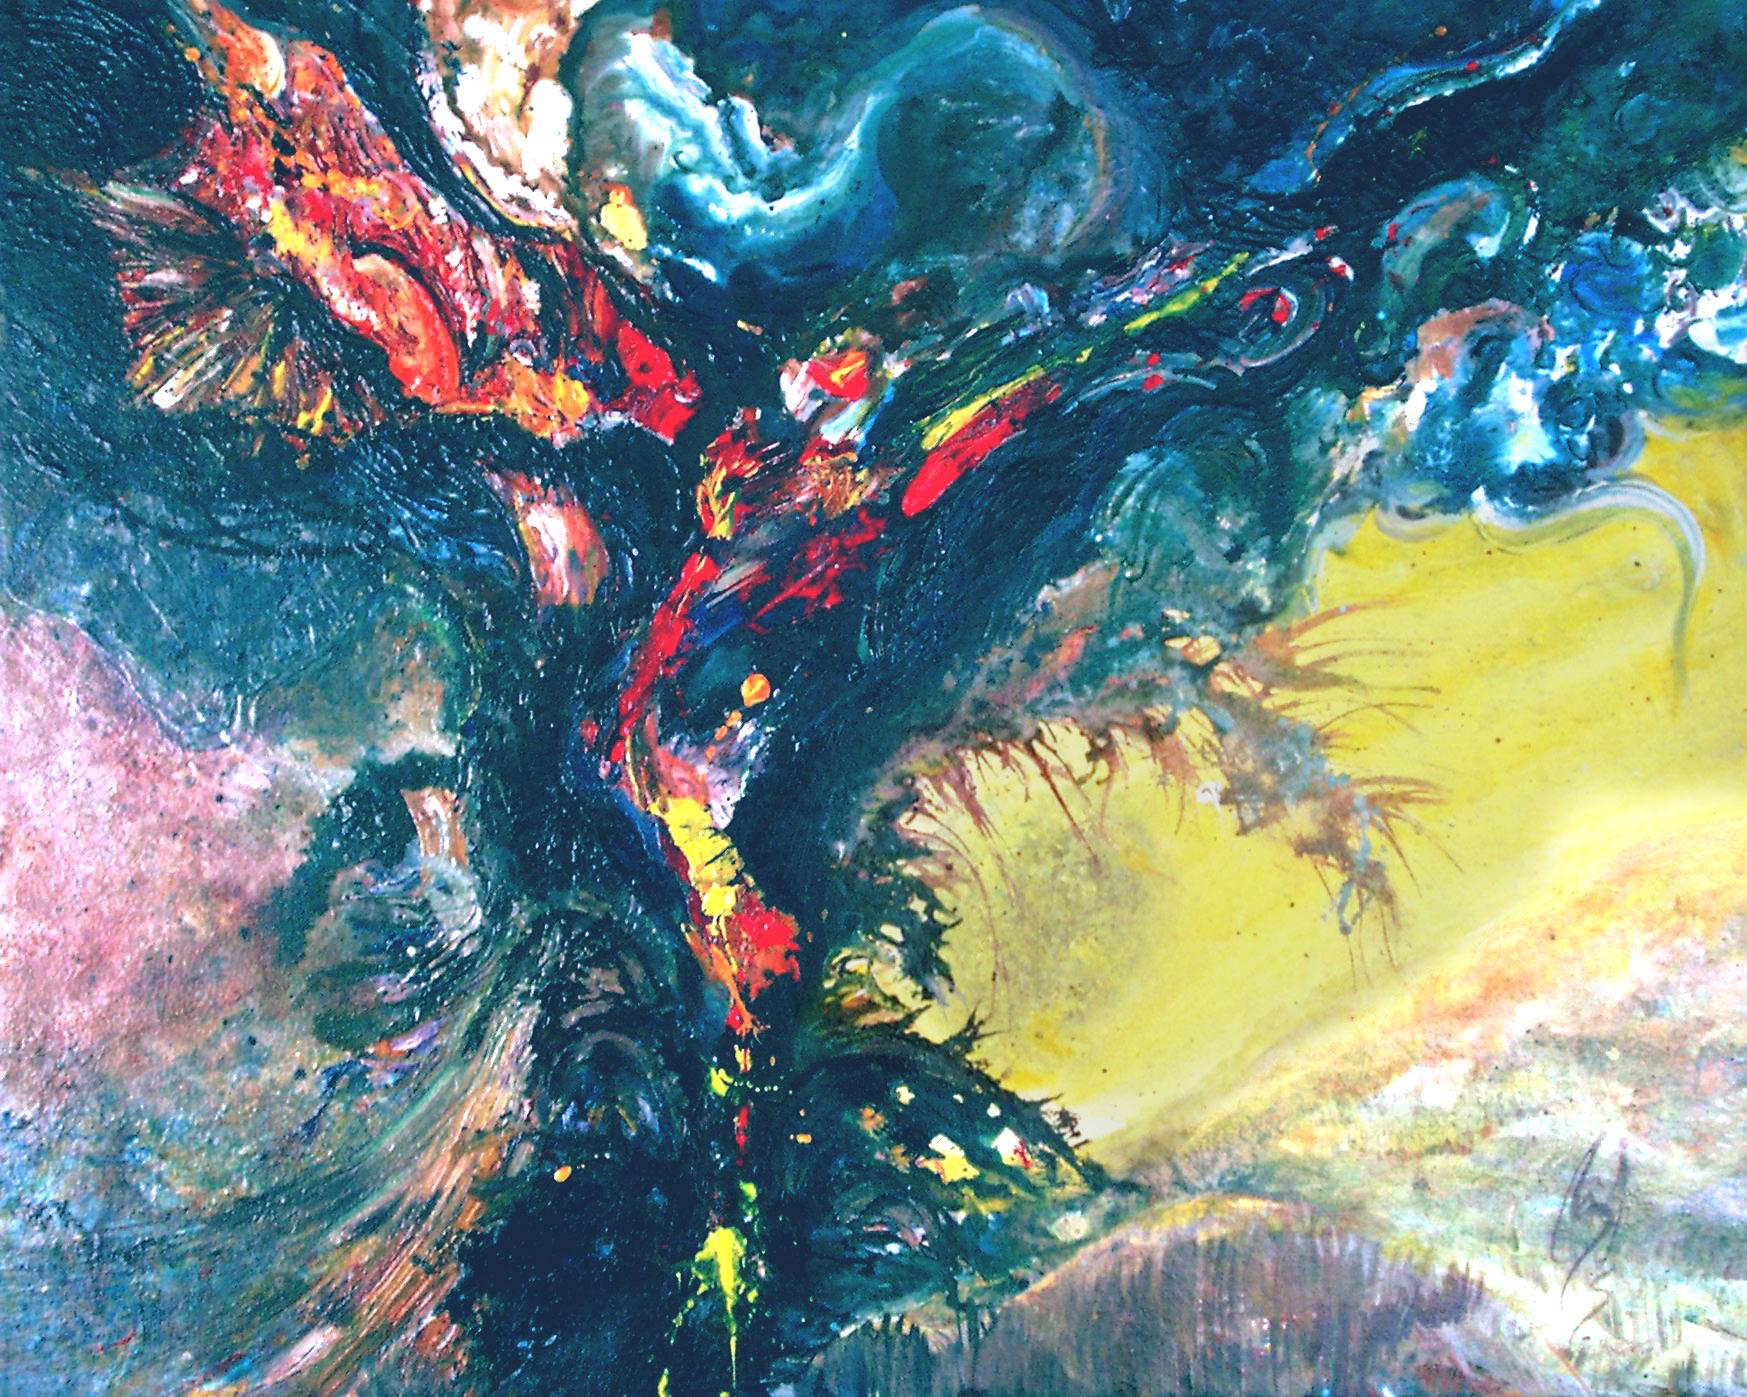 PHOENIX RISING - 24 x 30, acrylic o canvas